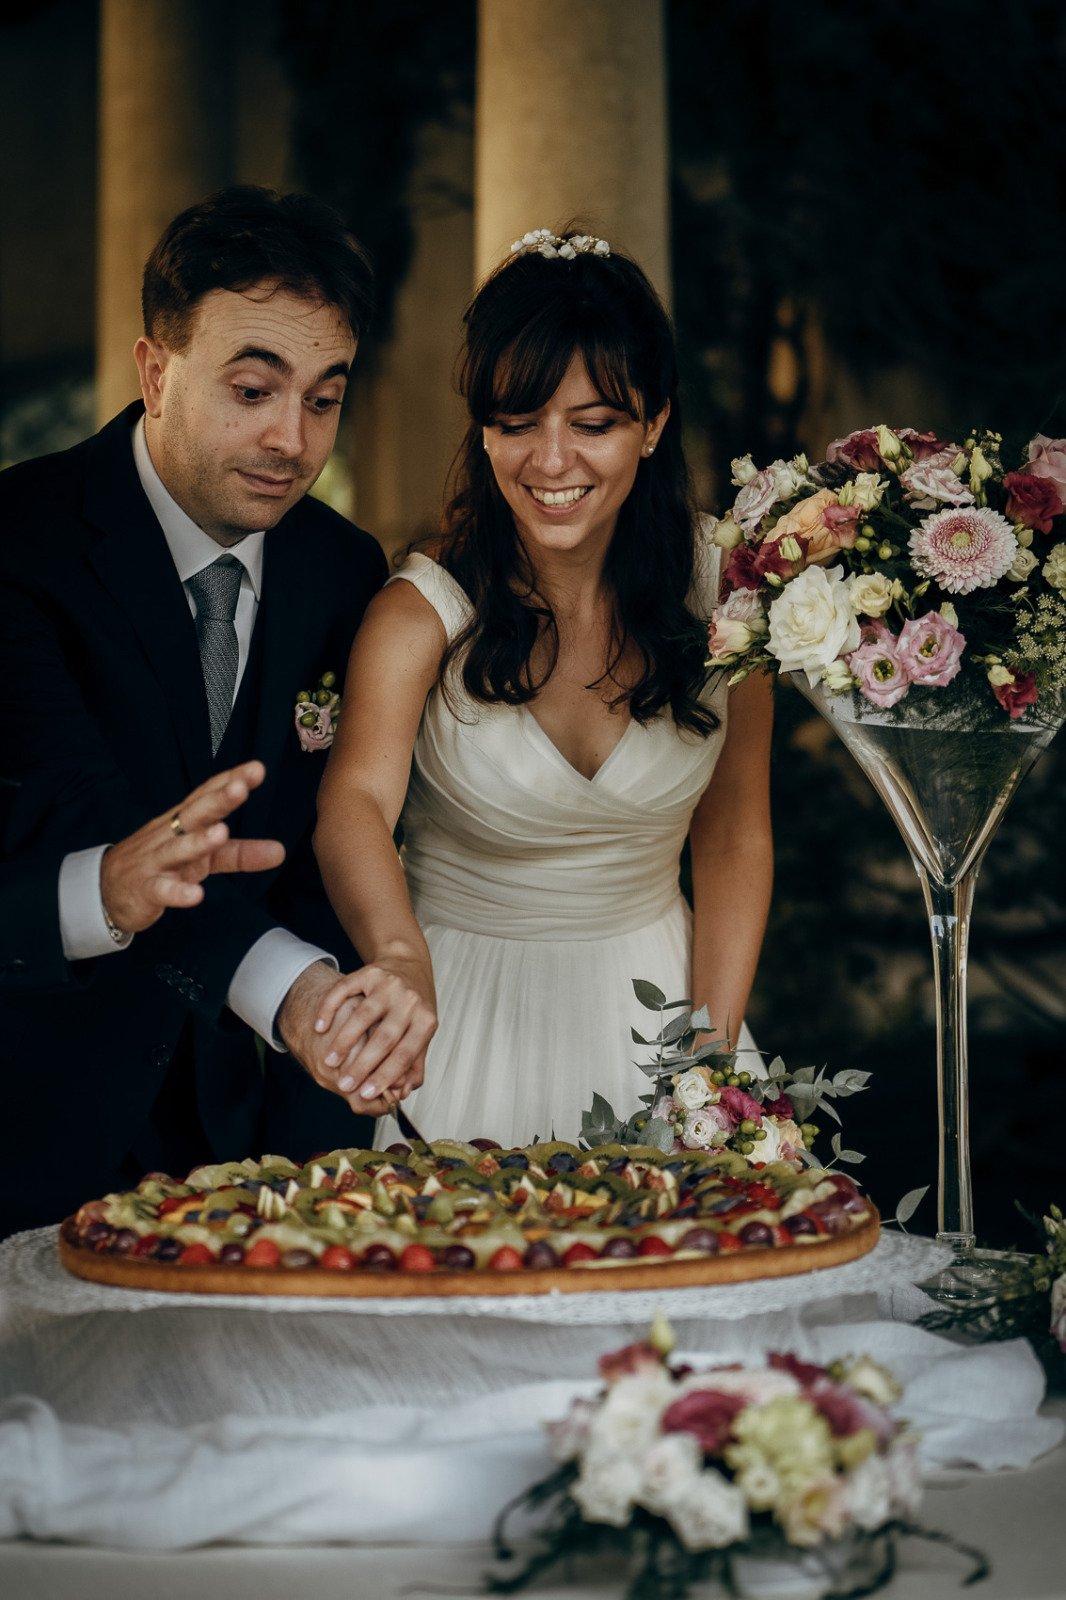 Matrimonio autunnale_64